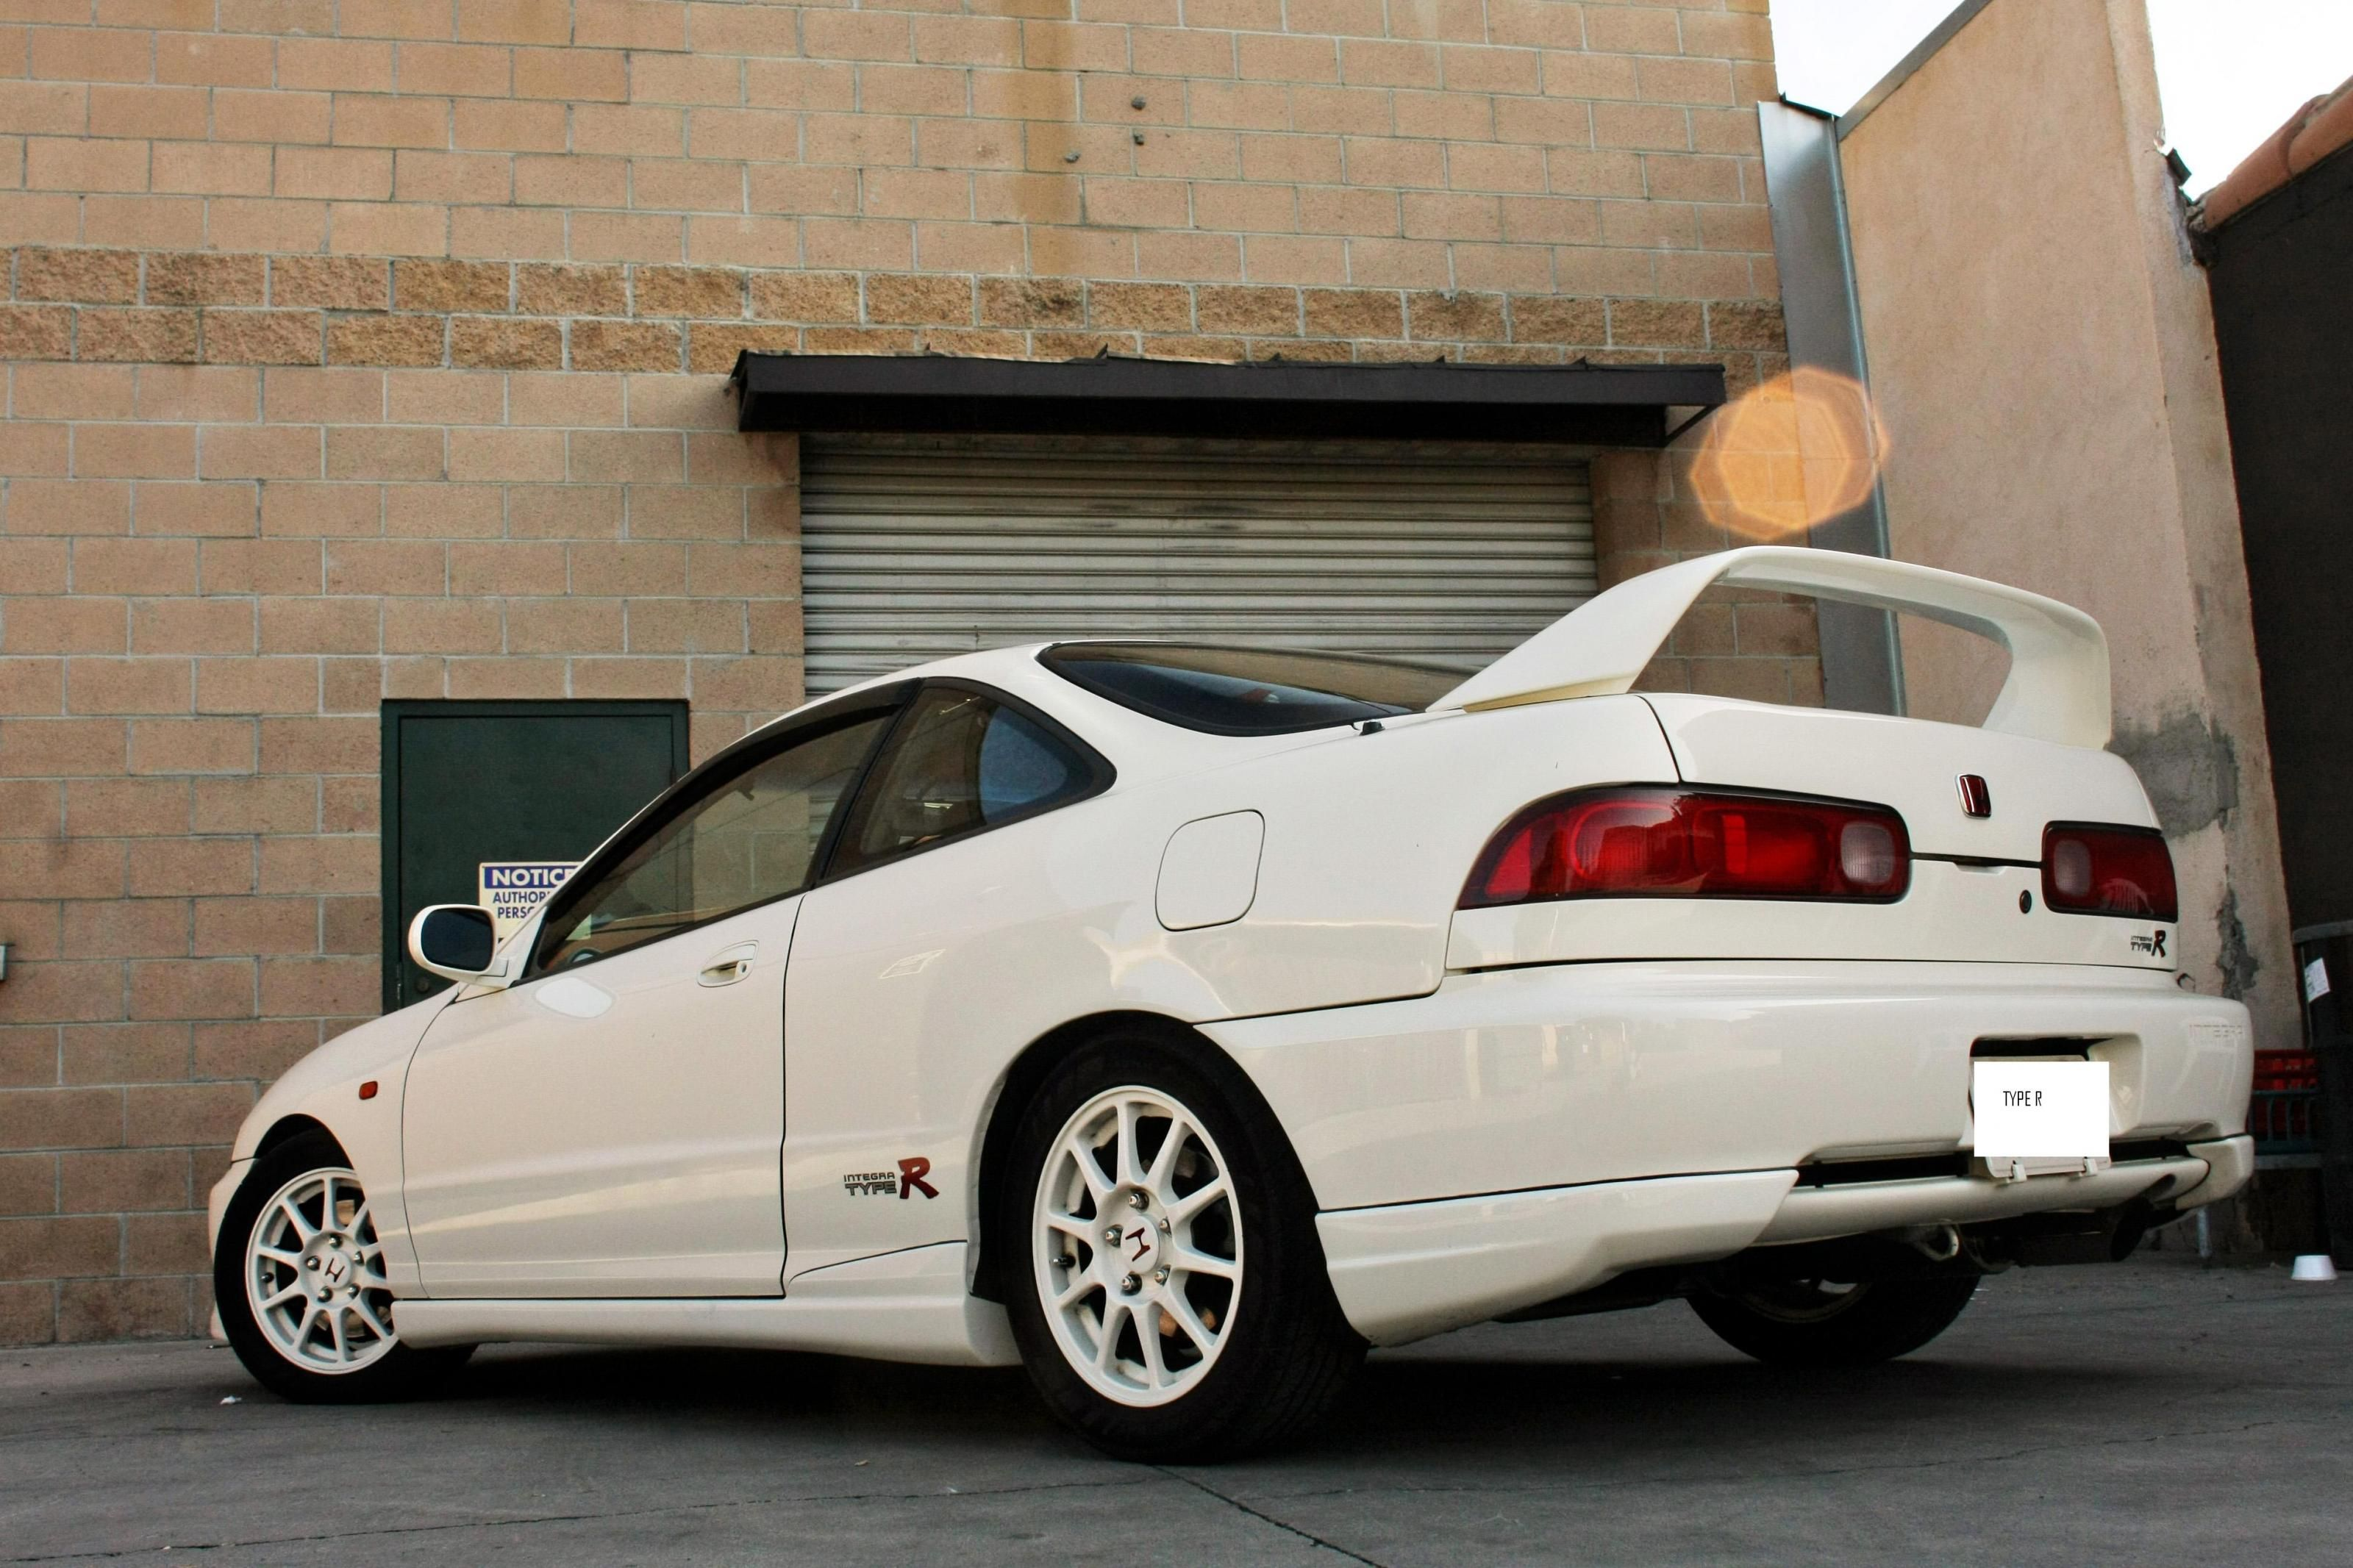 Cars For Sale: Integra TYPE-R\'s - Mar/Apr 2012 - Page 3 - Honda-Tech ...